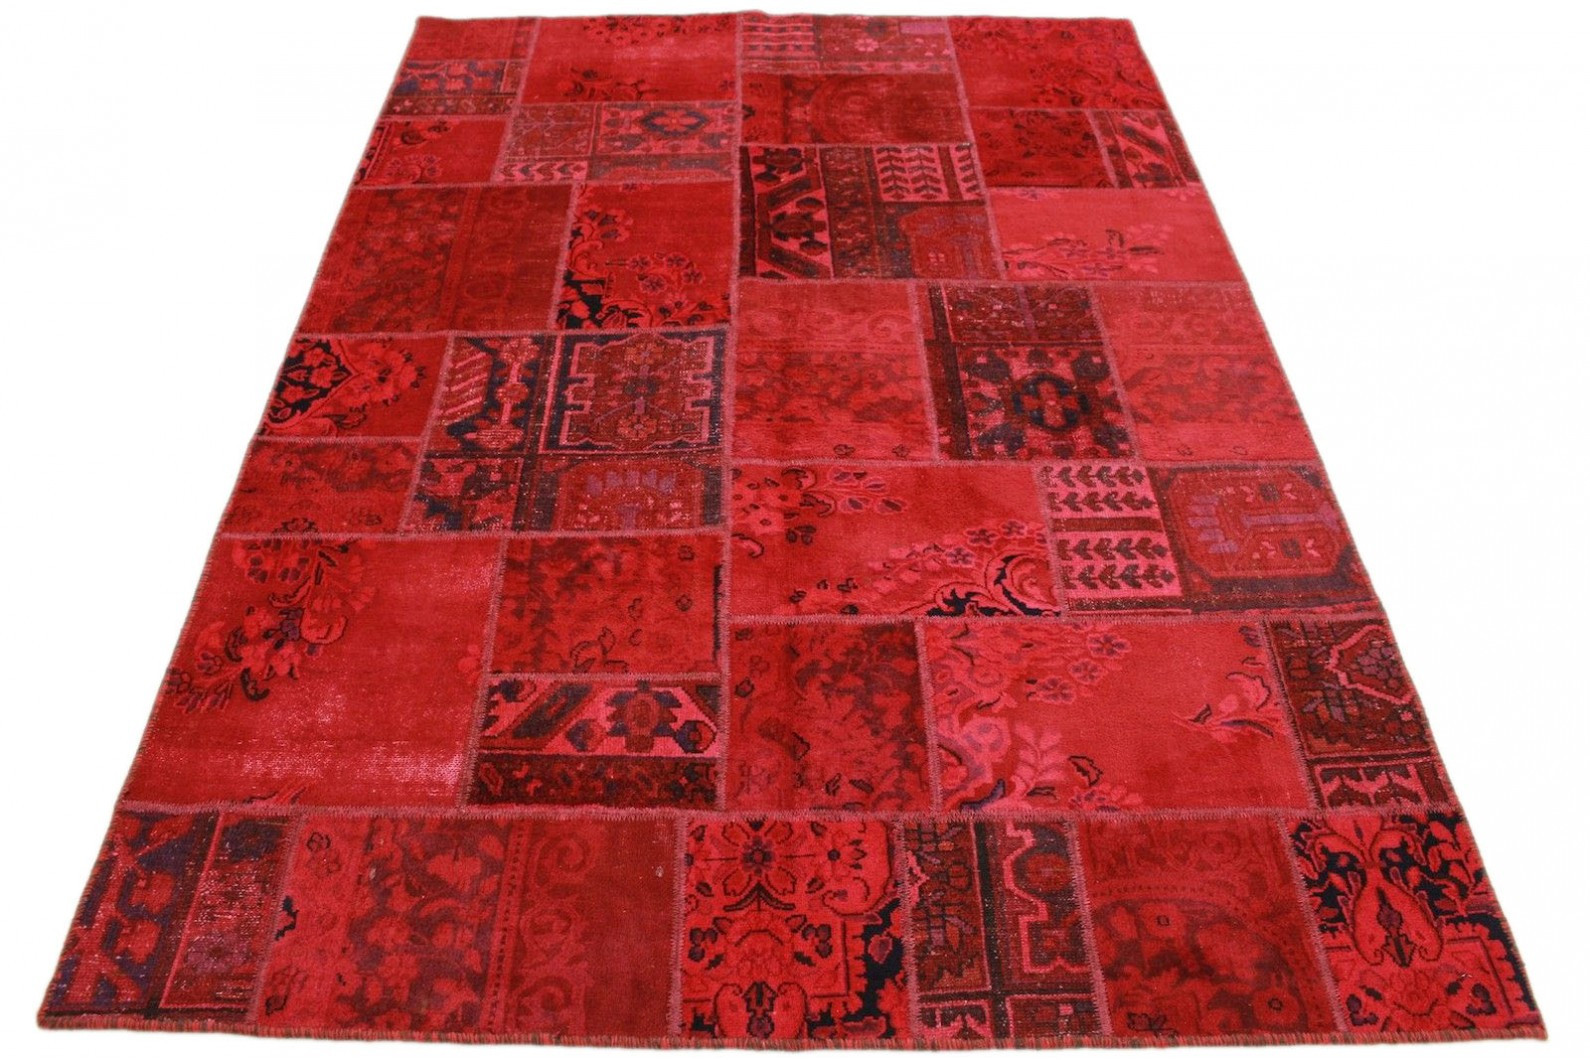 Teppich Rot  Patchwork Teppich Rot in 240x160cm 1001 2148 bei